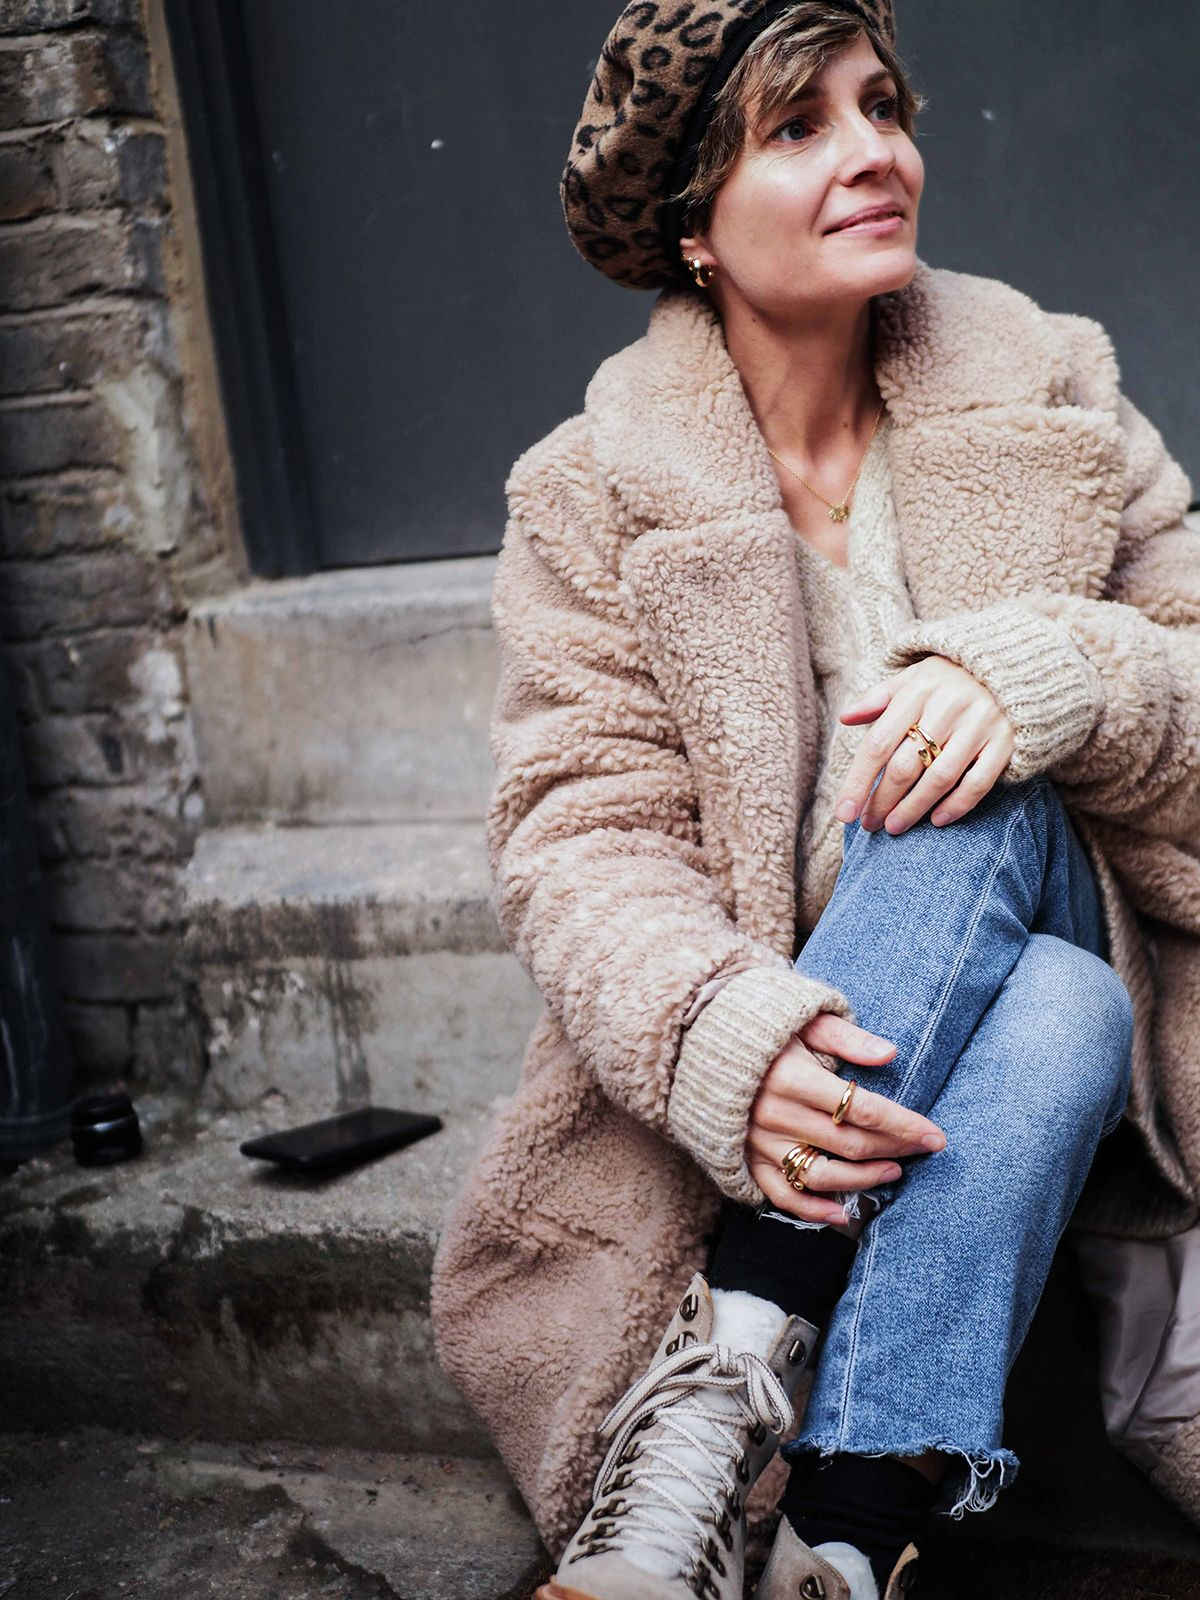 9f0cf910661f Stylonylon | Bear Basics | Bear Brooksbank Petite Outfits, Street Snap,  Sweater Fashion,